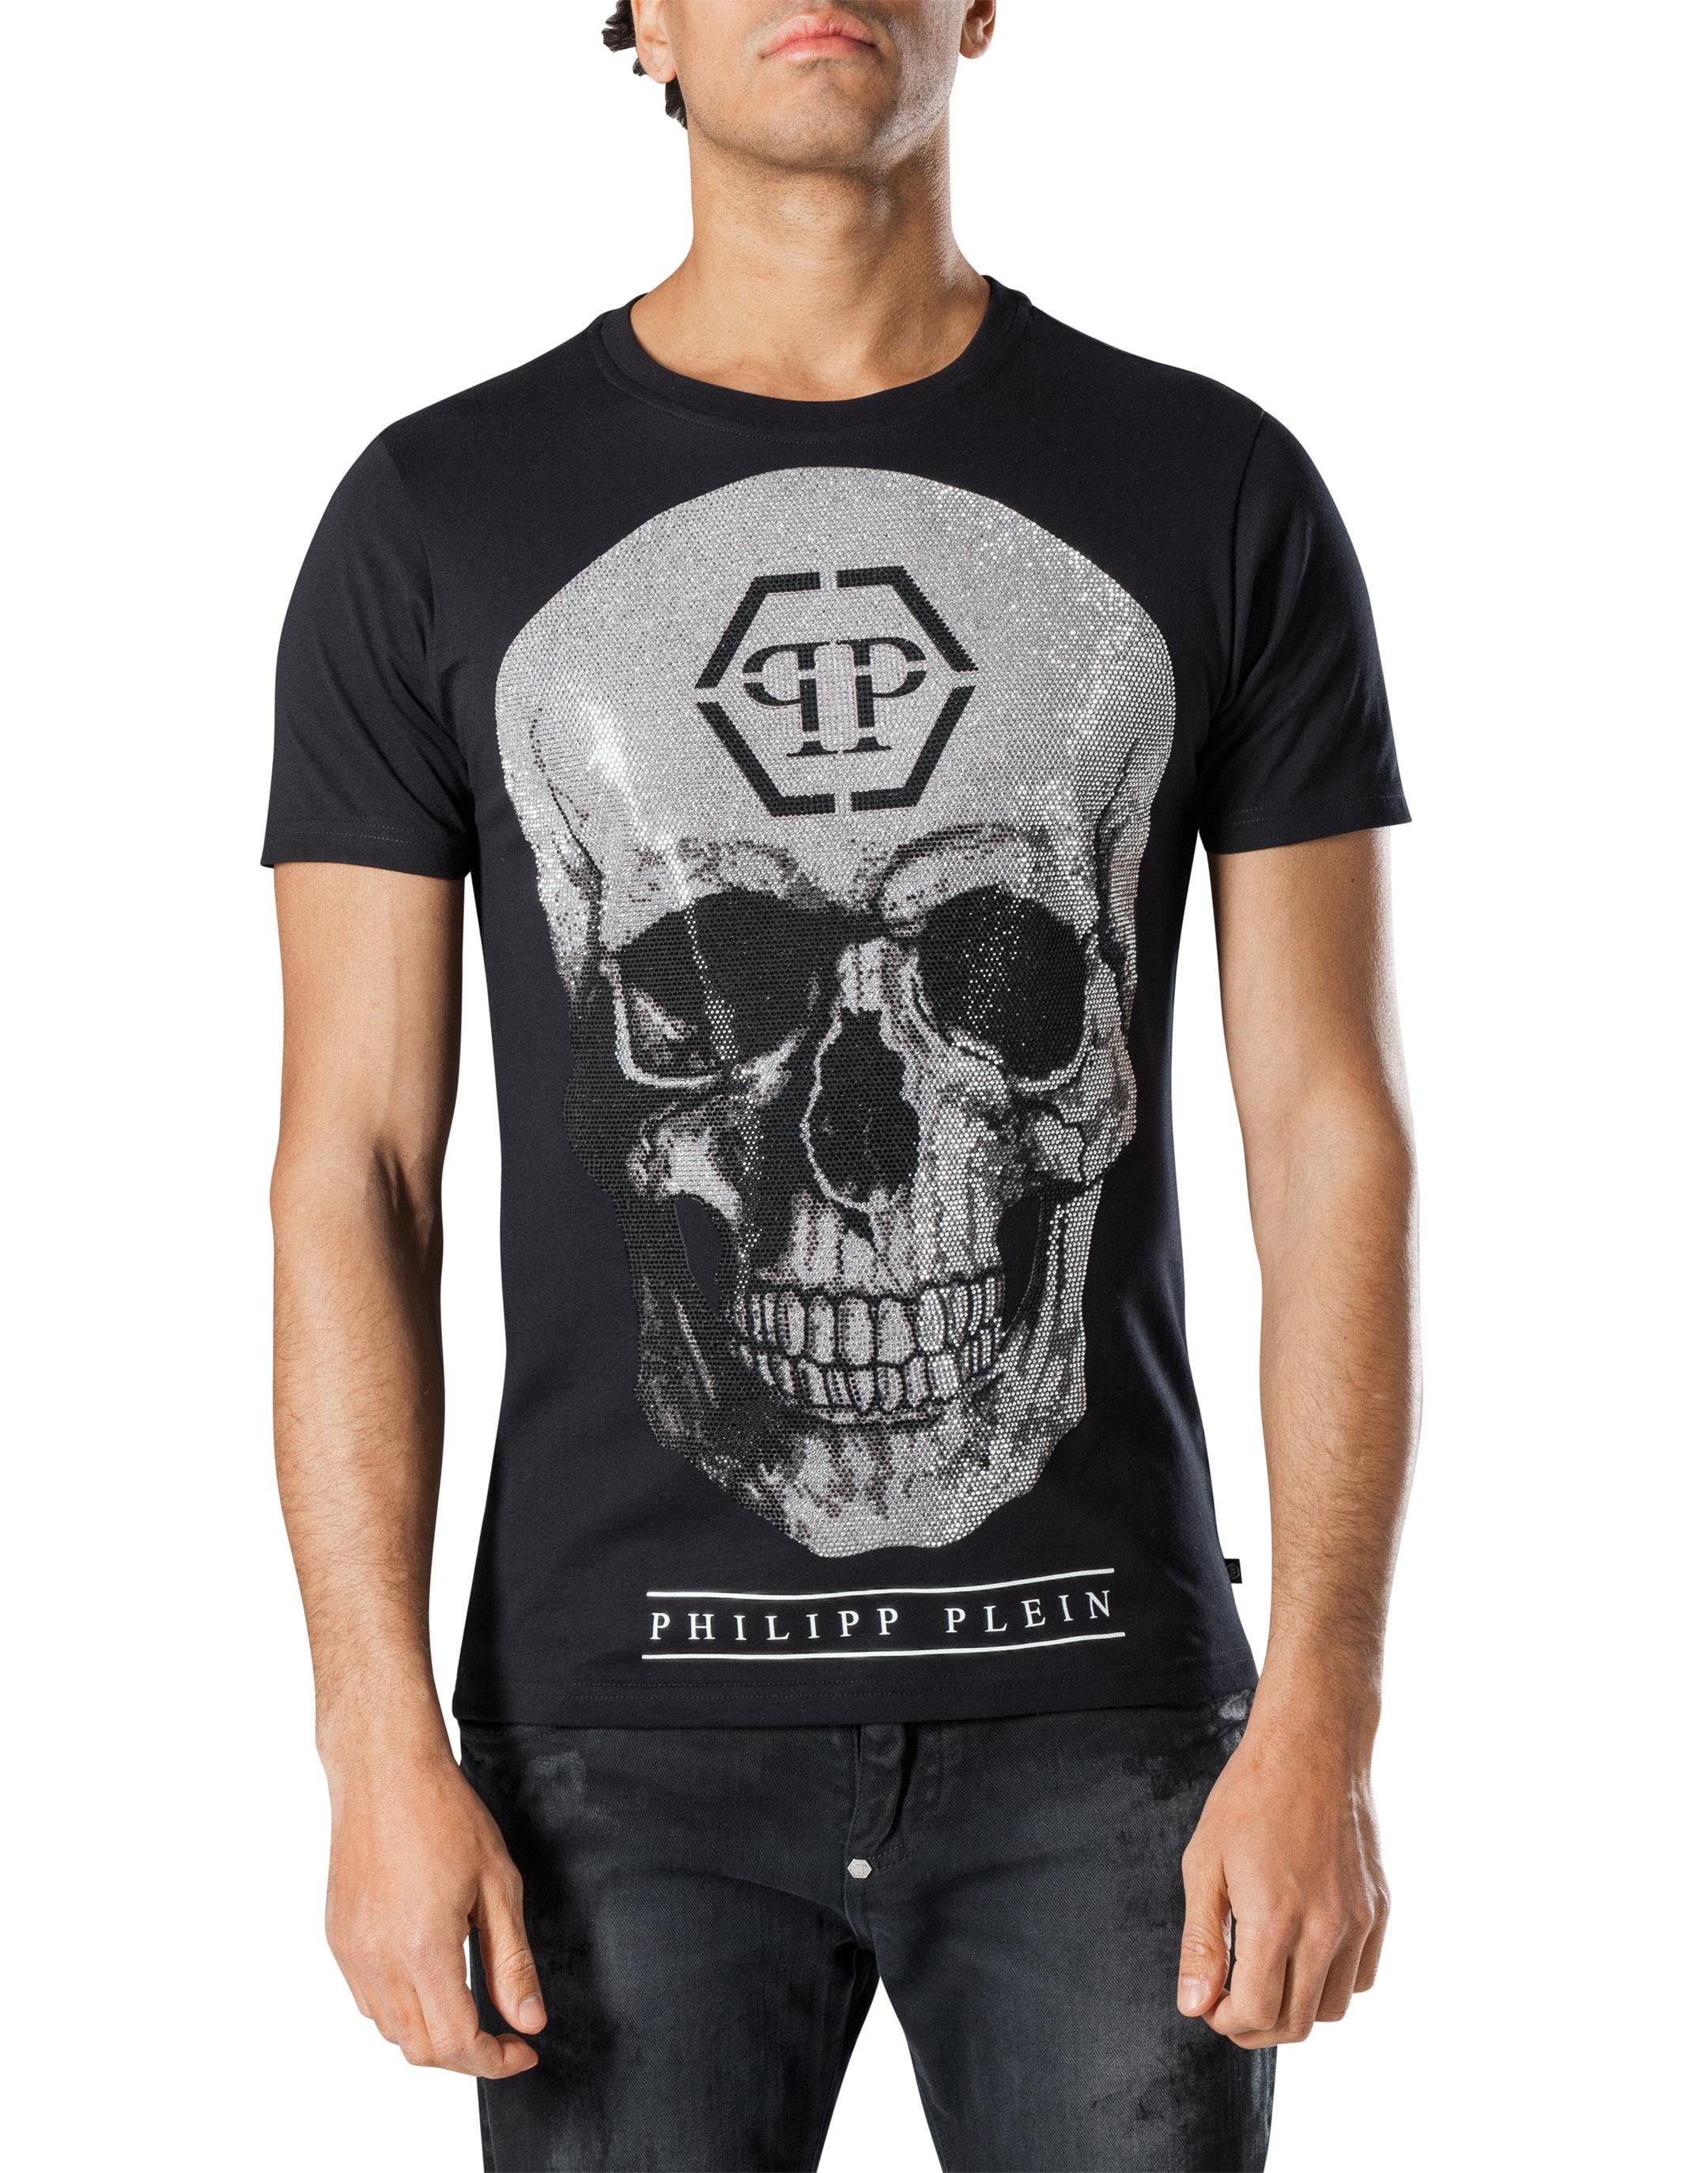 Camiseta Philipp Plein  e68559e705dd2